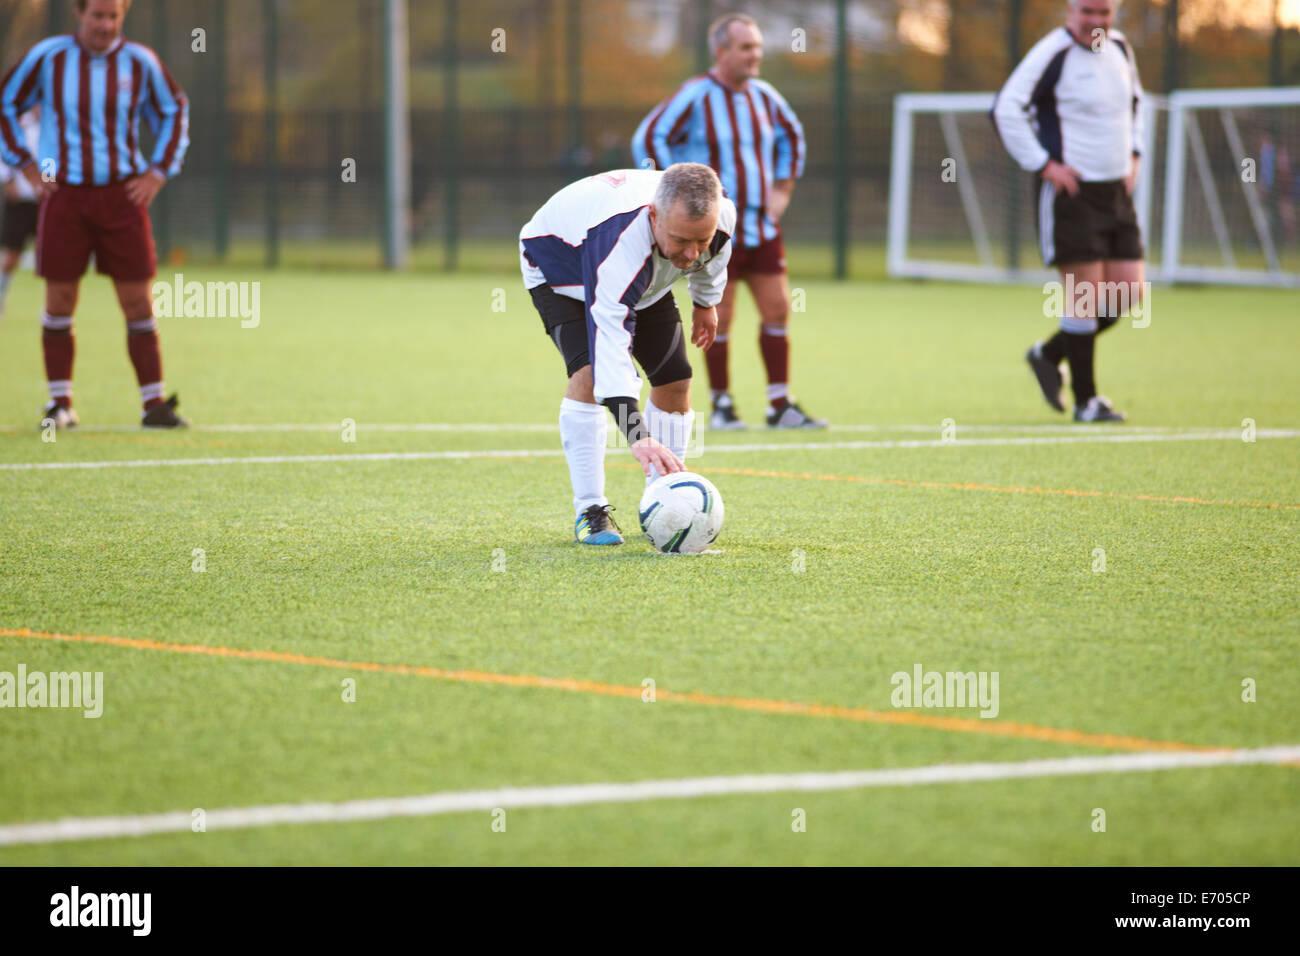 Football player positioning ball - Stock Image